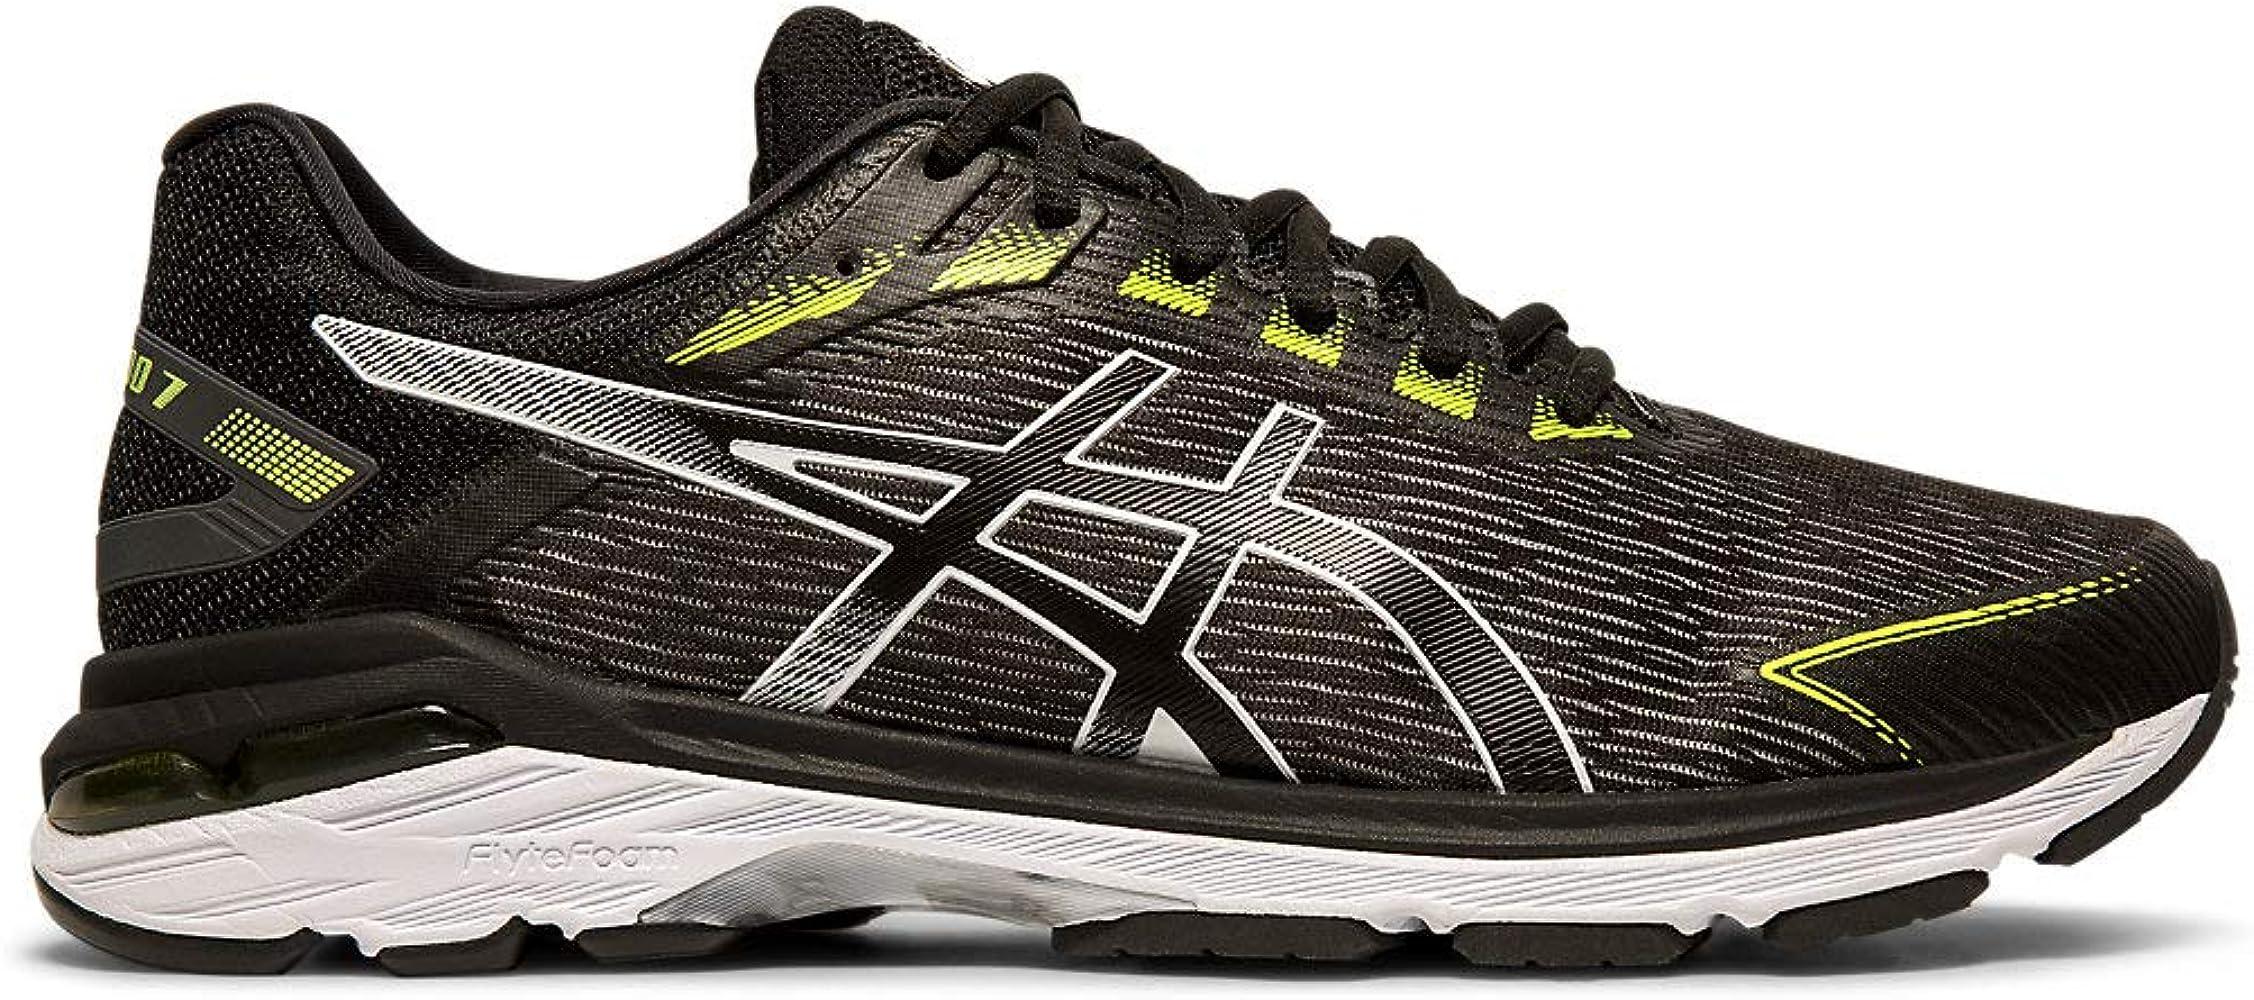 GT-2000 7 Twist Running Shoes, 6.5